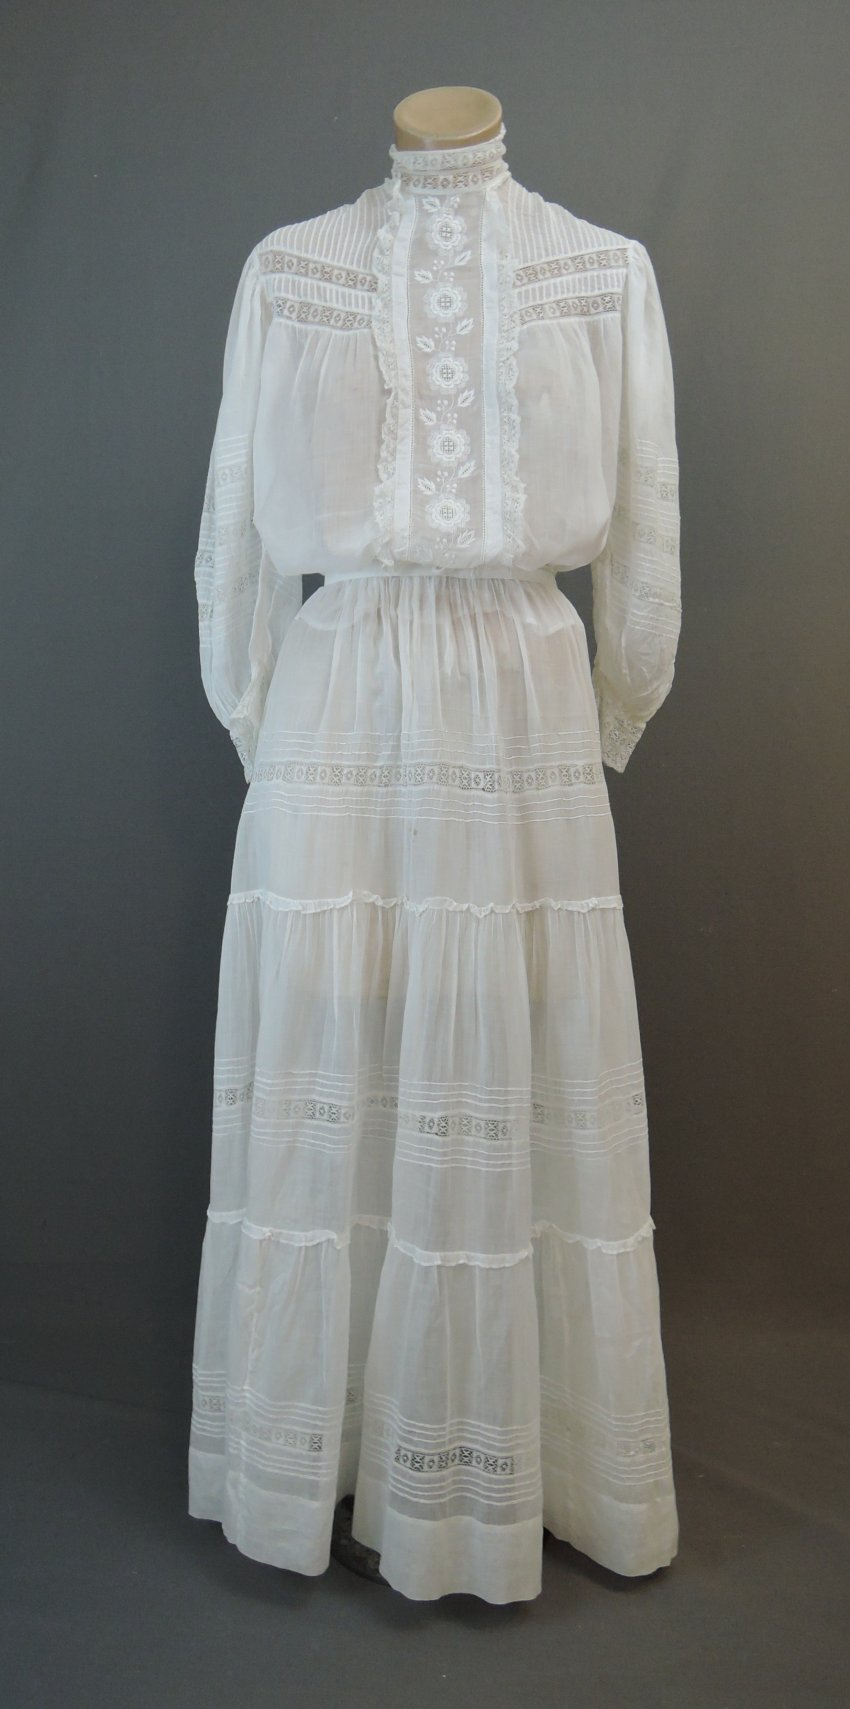 Edwardian Lace Blouse & Skirt, 2 Piece Dress Antique Sheer White Cotton 1900s, 34 bust, 24 inch waist